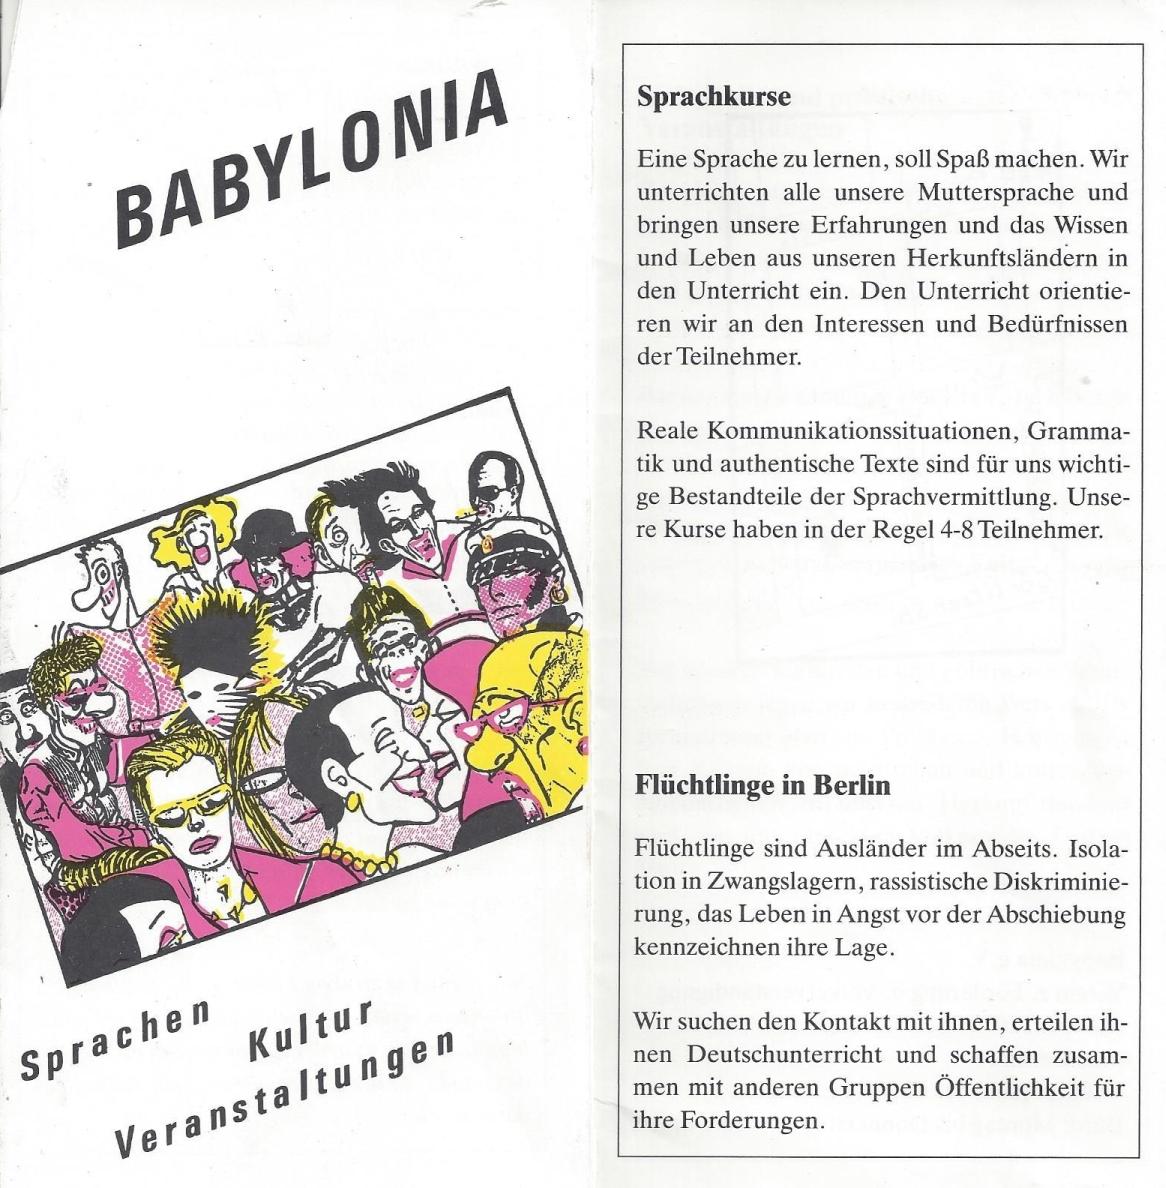 Bayblonia-kl